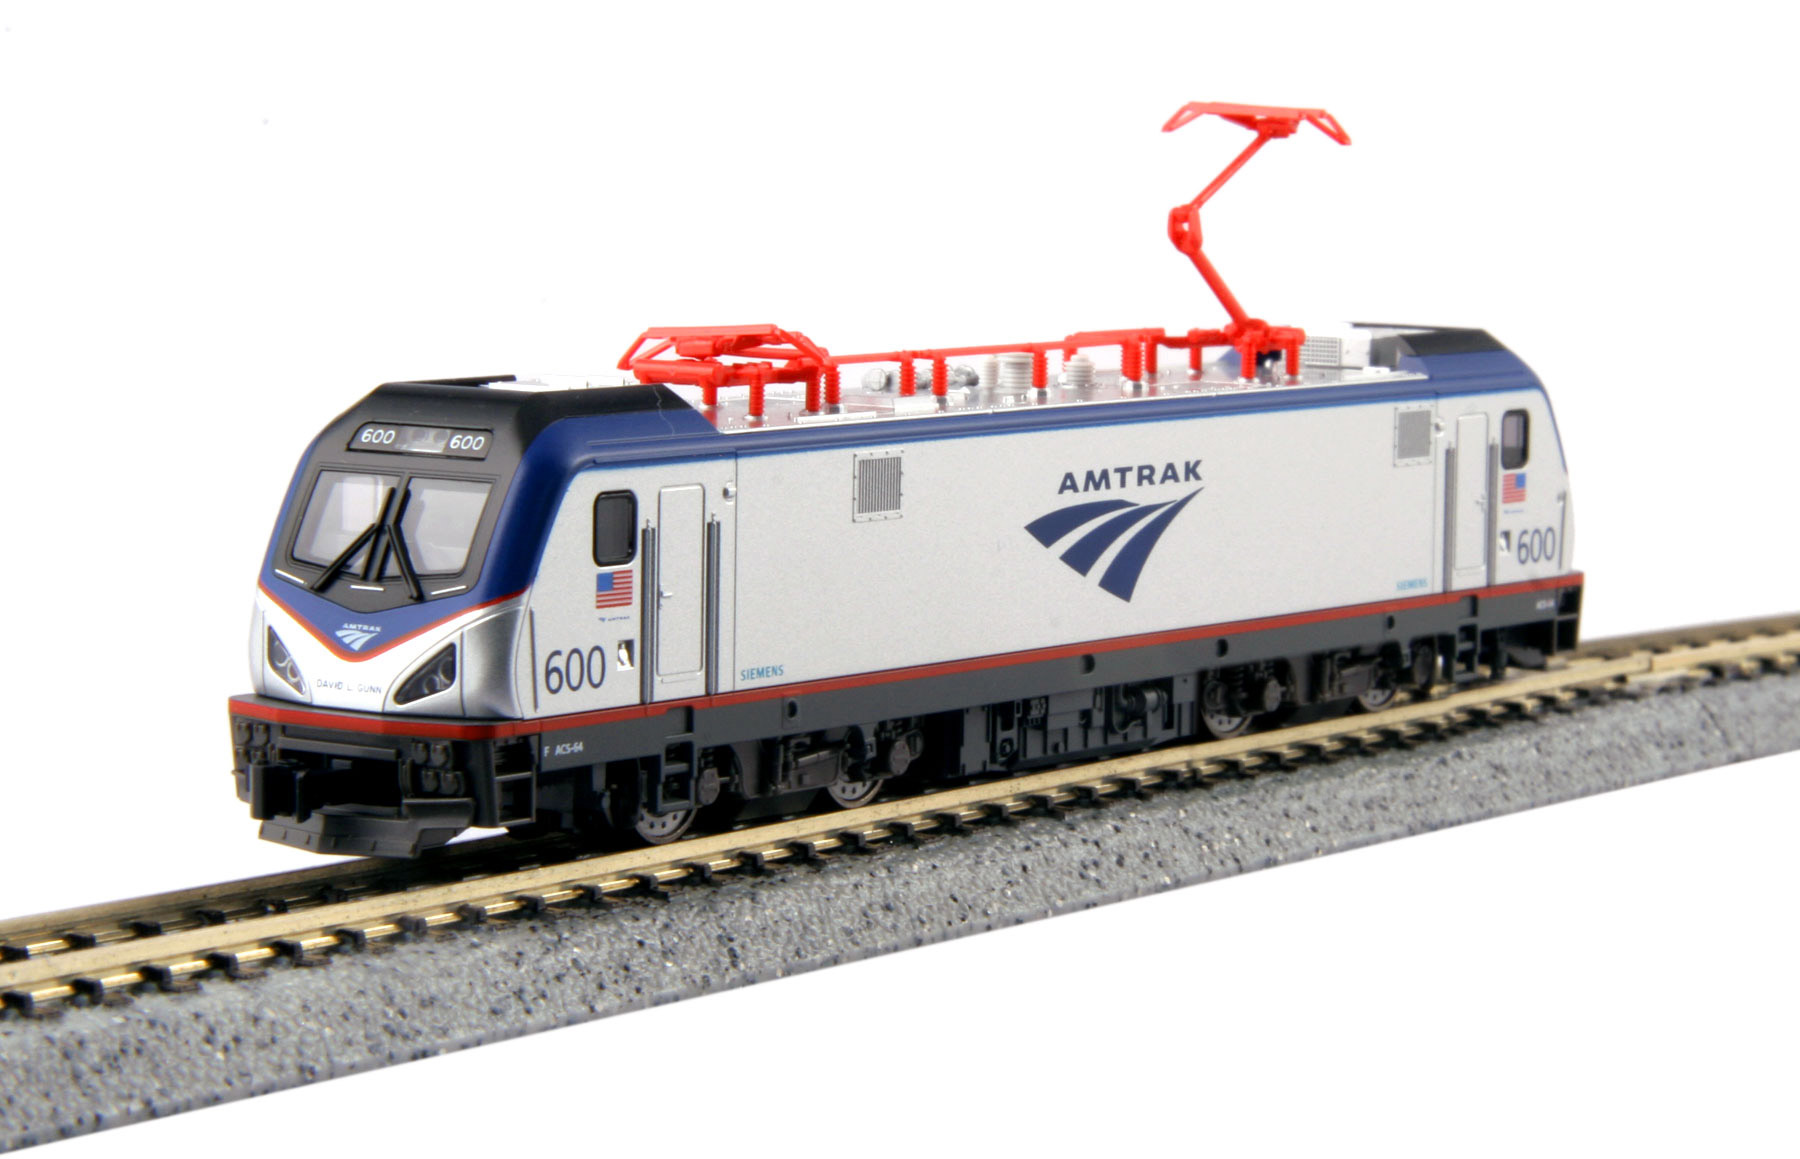 N Scale - Kato USA - 137-3001 - Locomotive, Electric, ACS-64 - Amtrak - 600